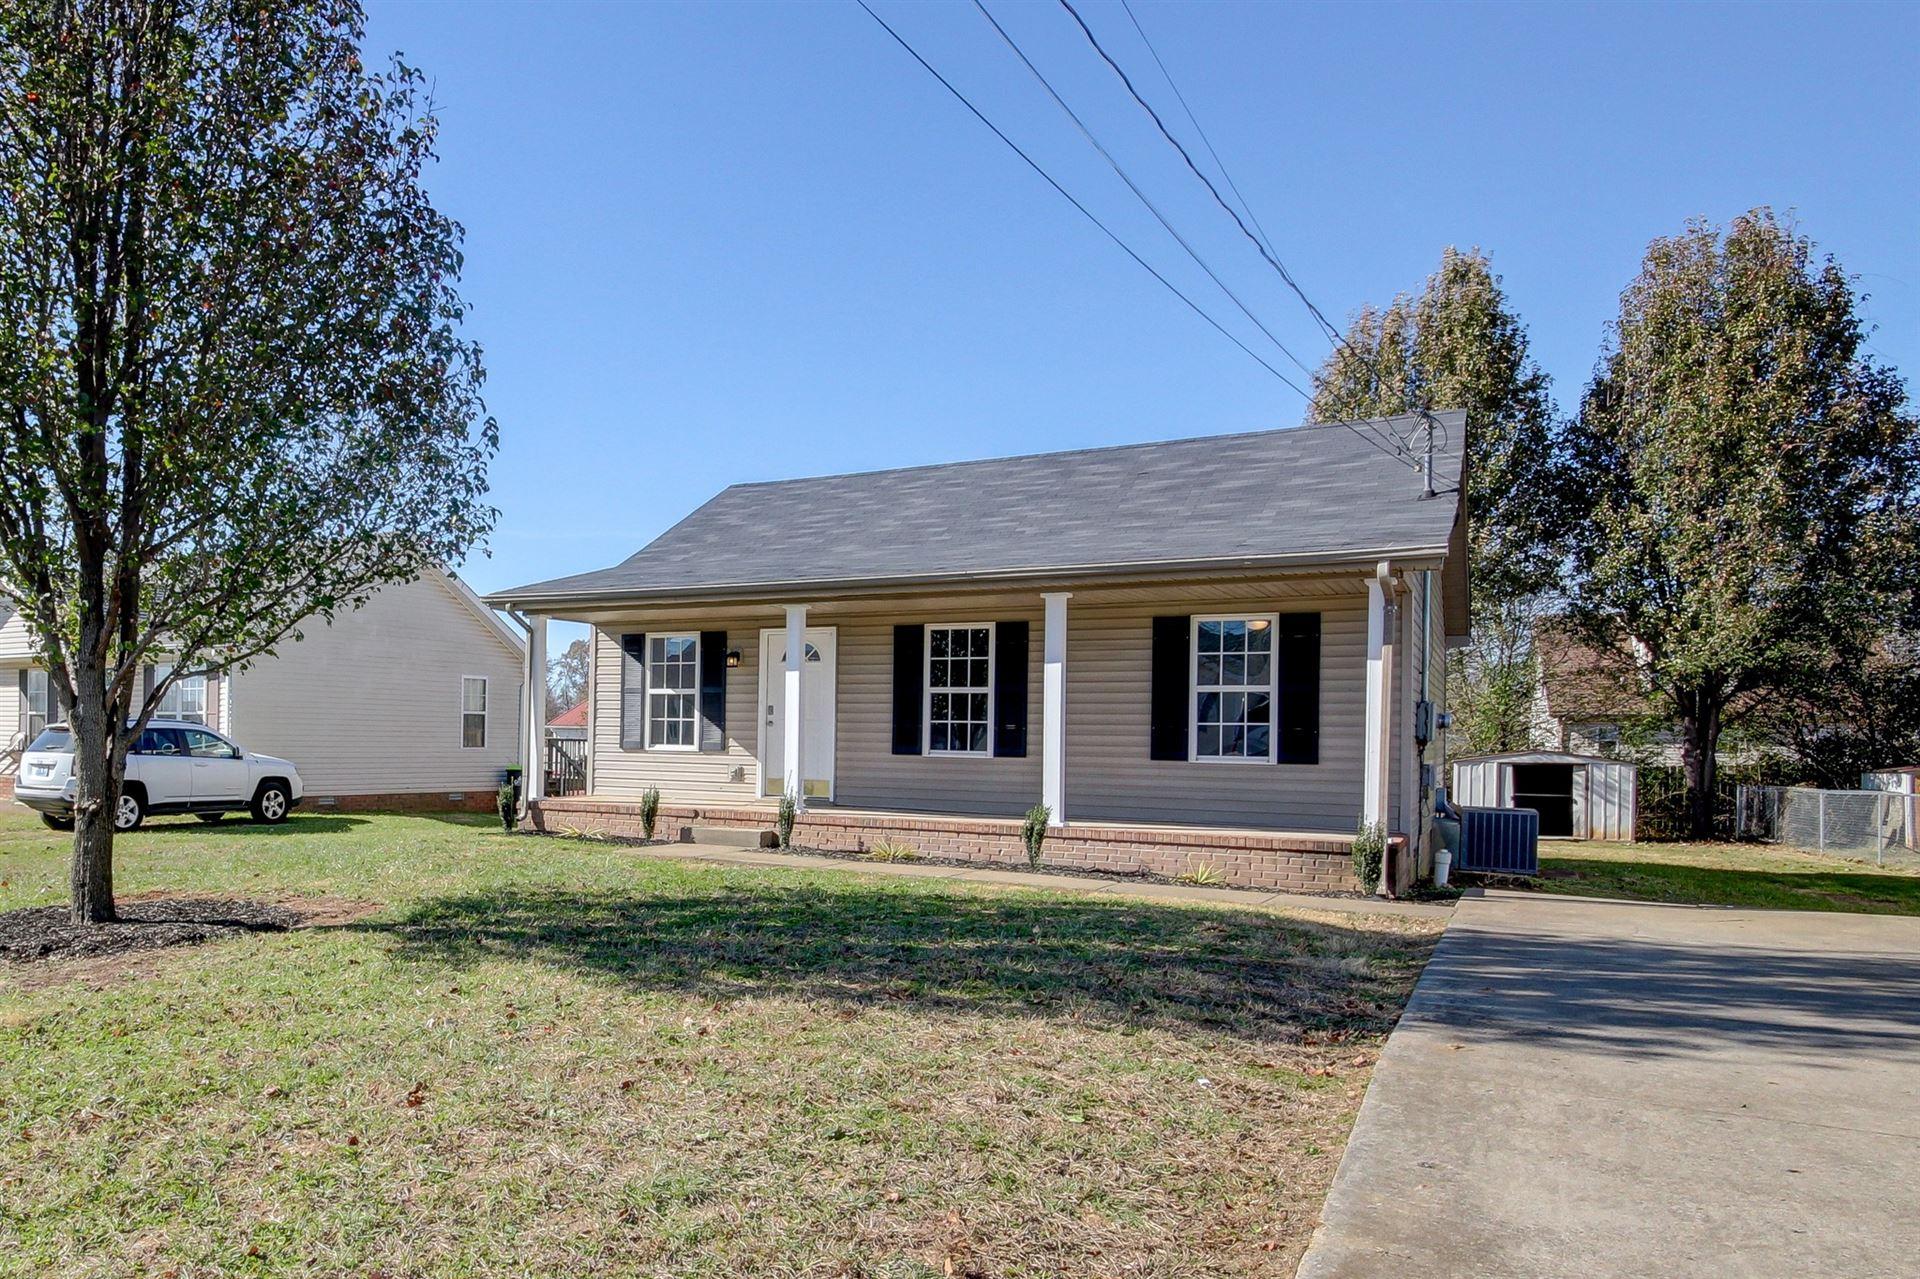 238 Cranklen Cir, Clarksville, TN 37042 - MLS#: 2208572